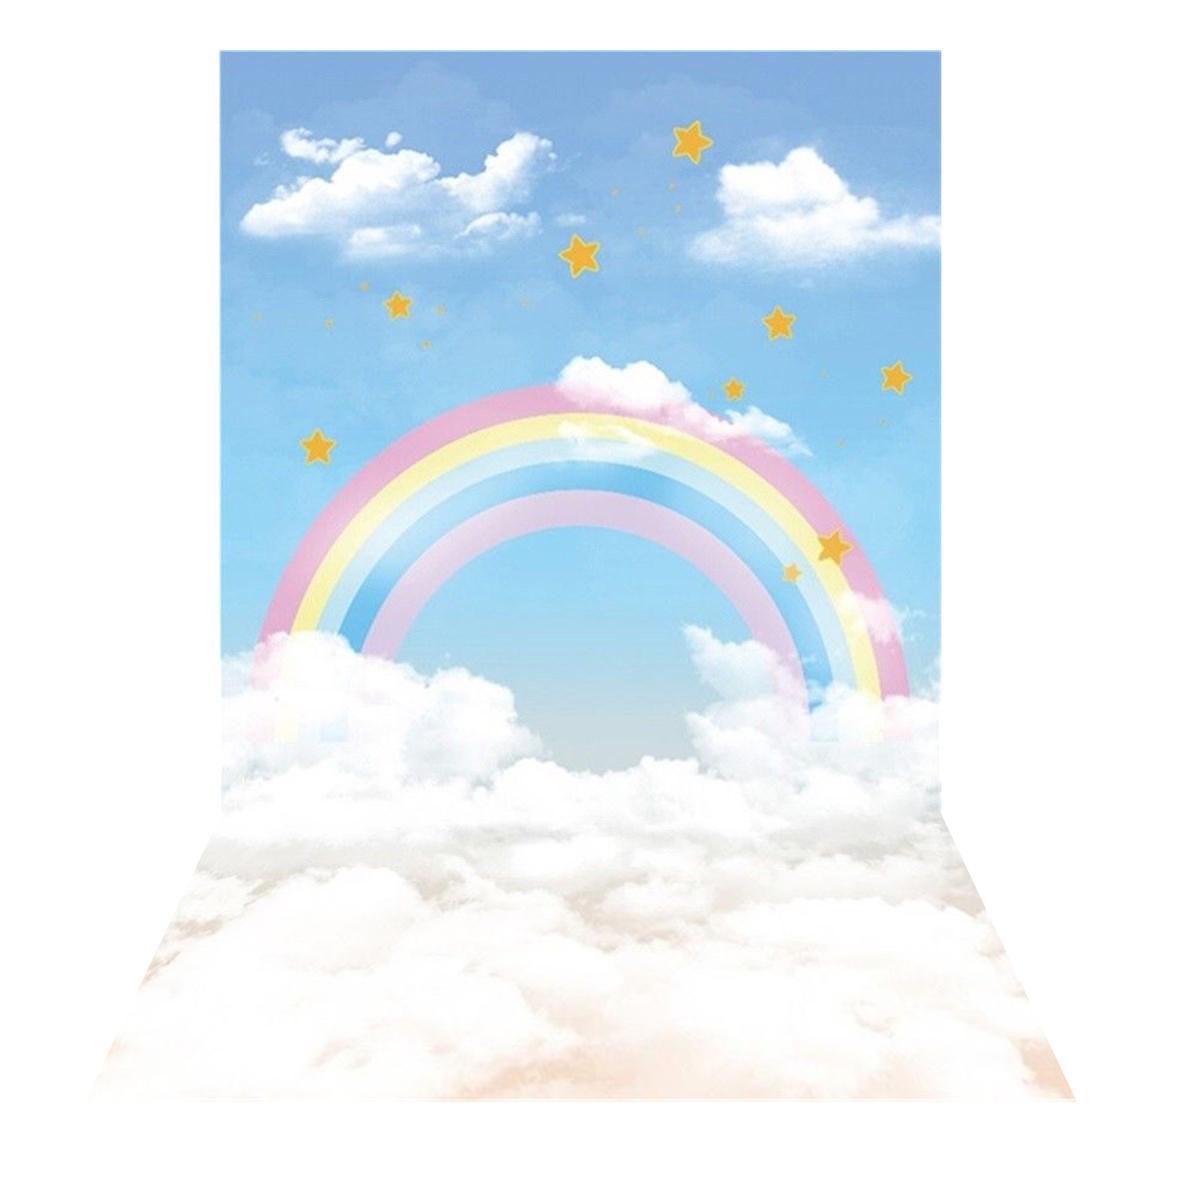 2.1m x 1.5m Rainbow Clouds Stars Theme Photography Vinyl Backdrop Studio Backgro